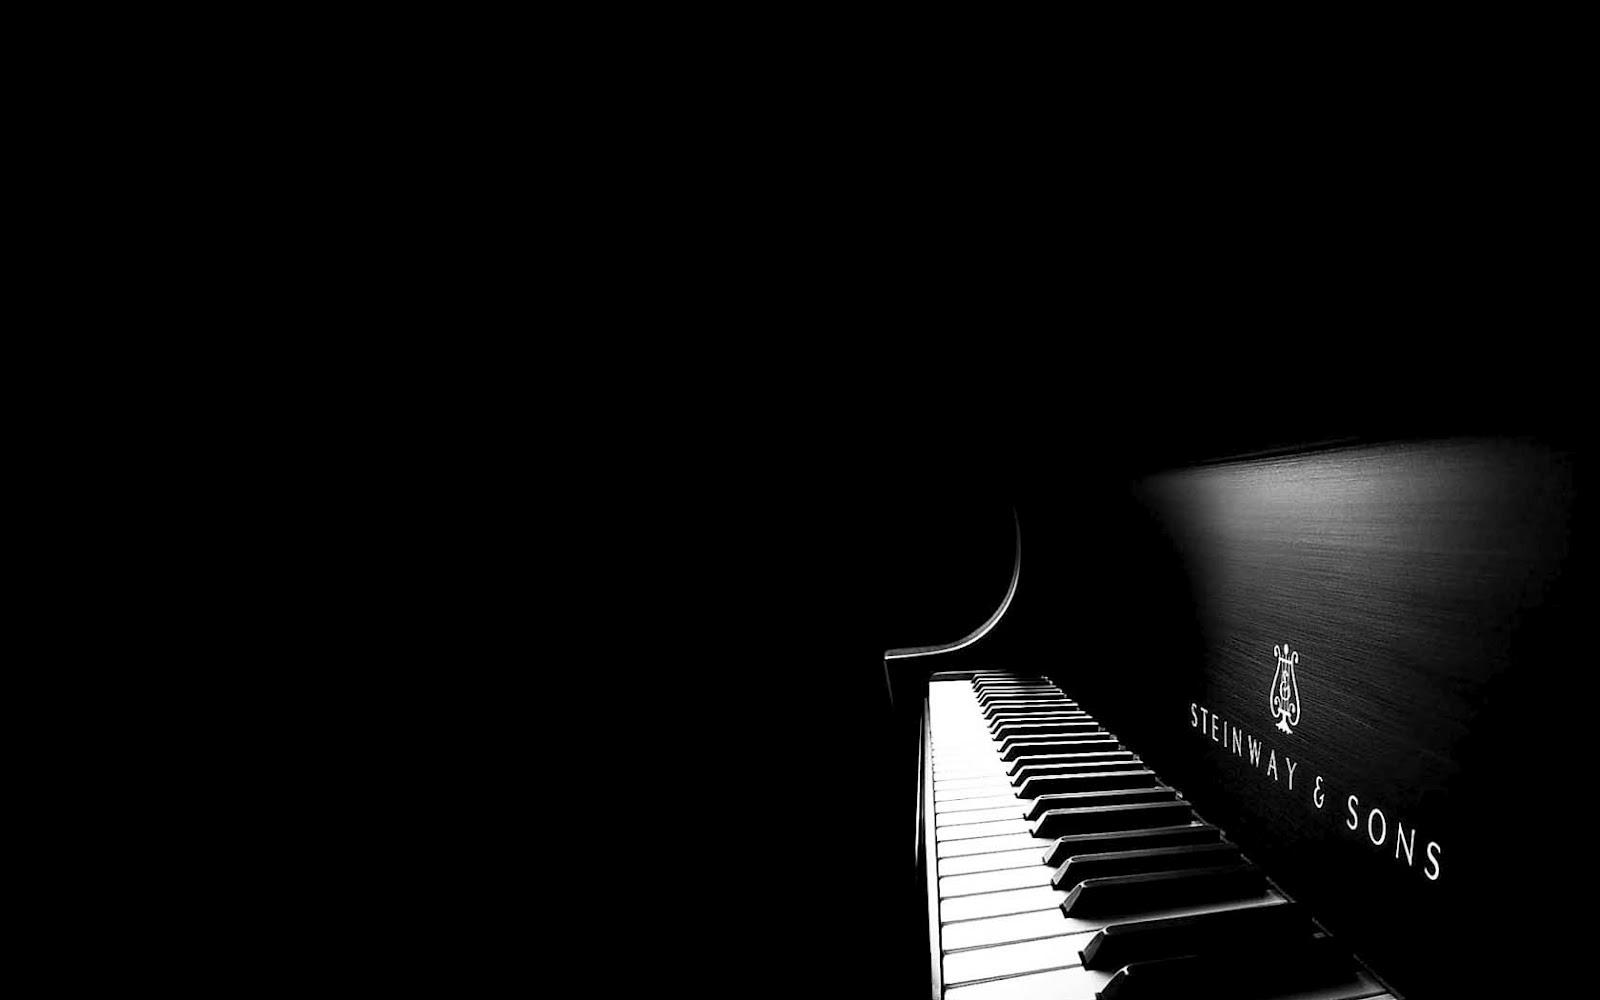 https://3.bp.blogspot.com/-TGr8kElo54Q/UGhDYR6clEI/AAAAAAAAE8g/vLQv82v4Rqc/s1600/Steinway-and-Sons-Piano-Close-Up-Photo-HD-Wallpaper--Vvallpaper.Net.jpg